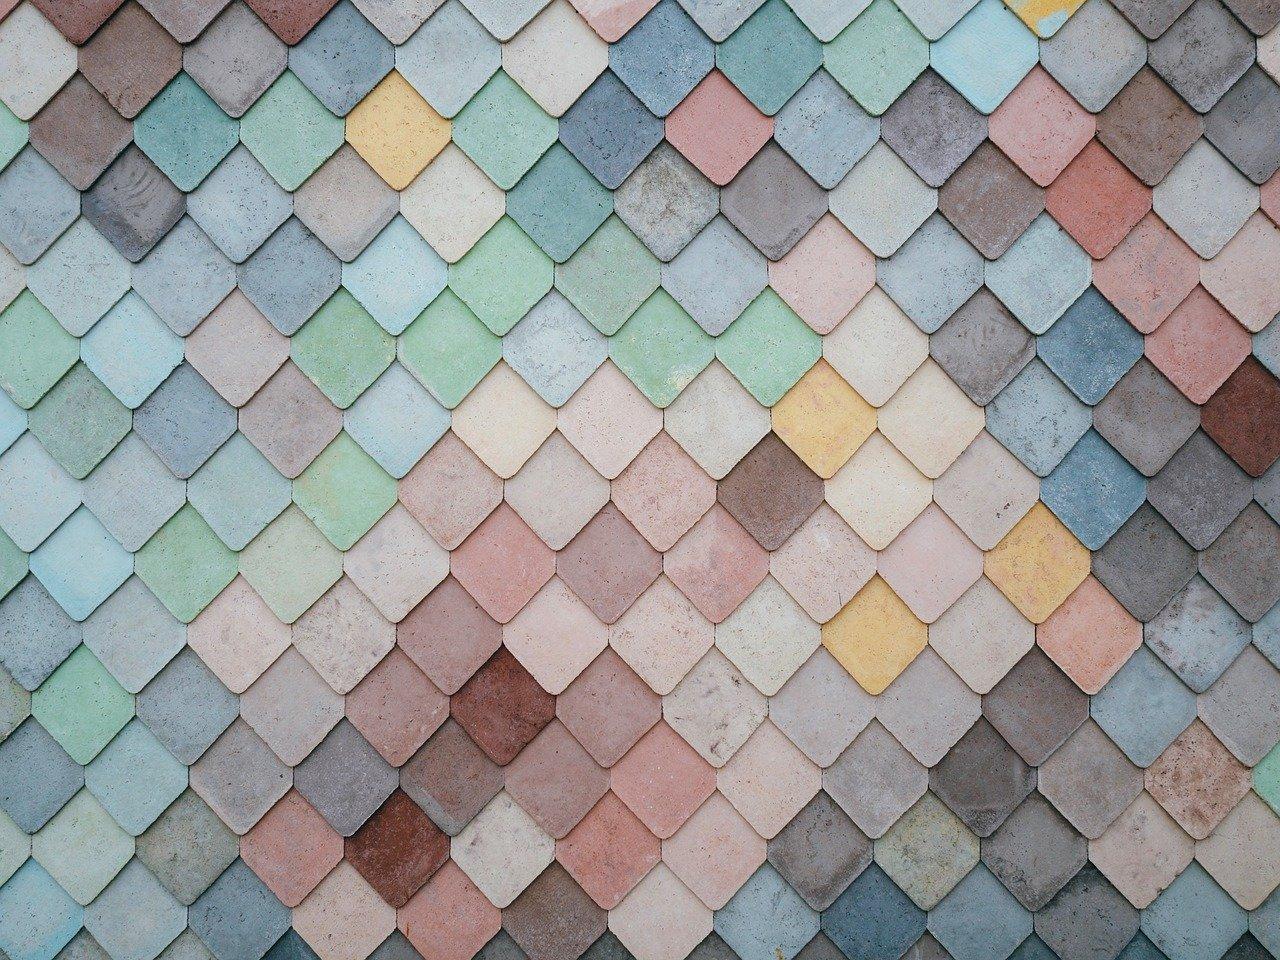 tiles shapes 2617112 1280